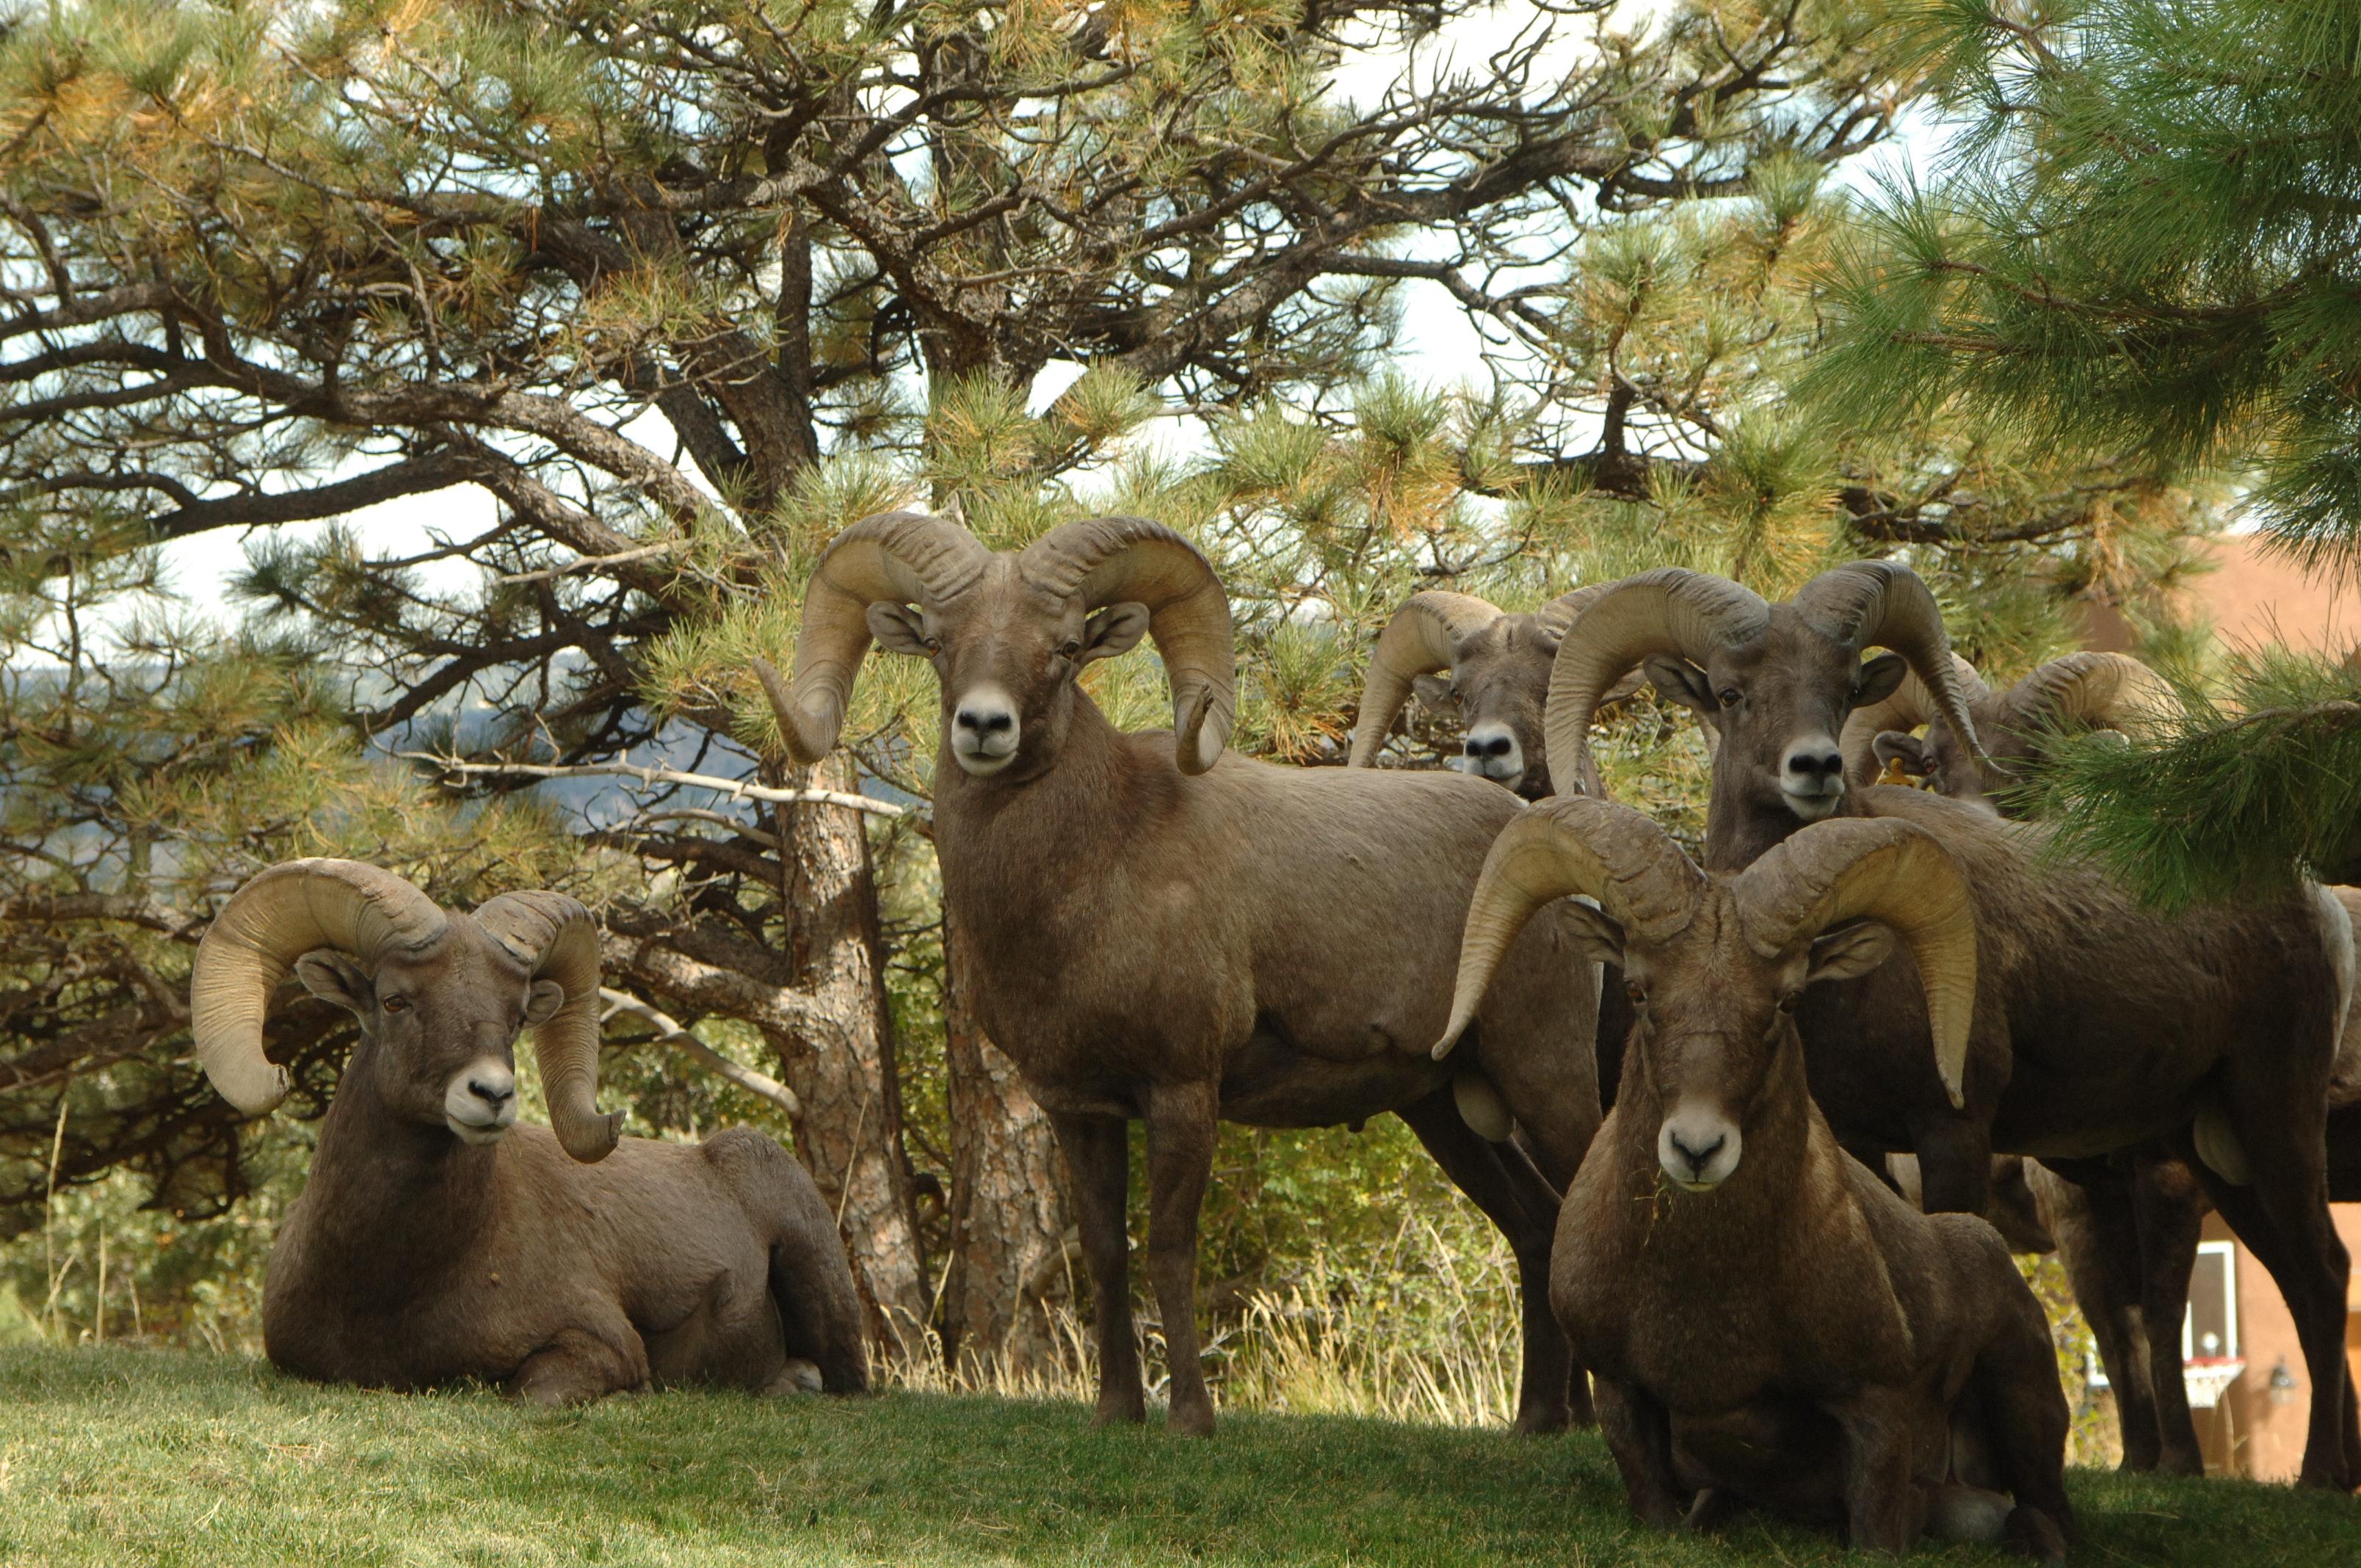 Brown Ram Goat 183 Free Stock Photo